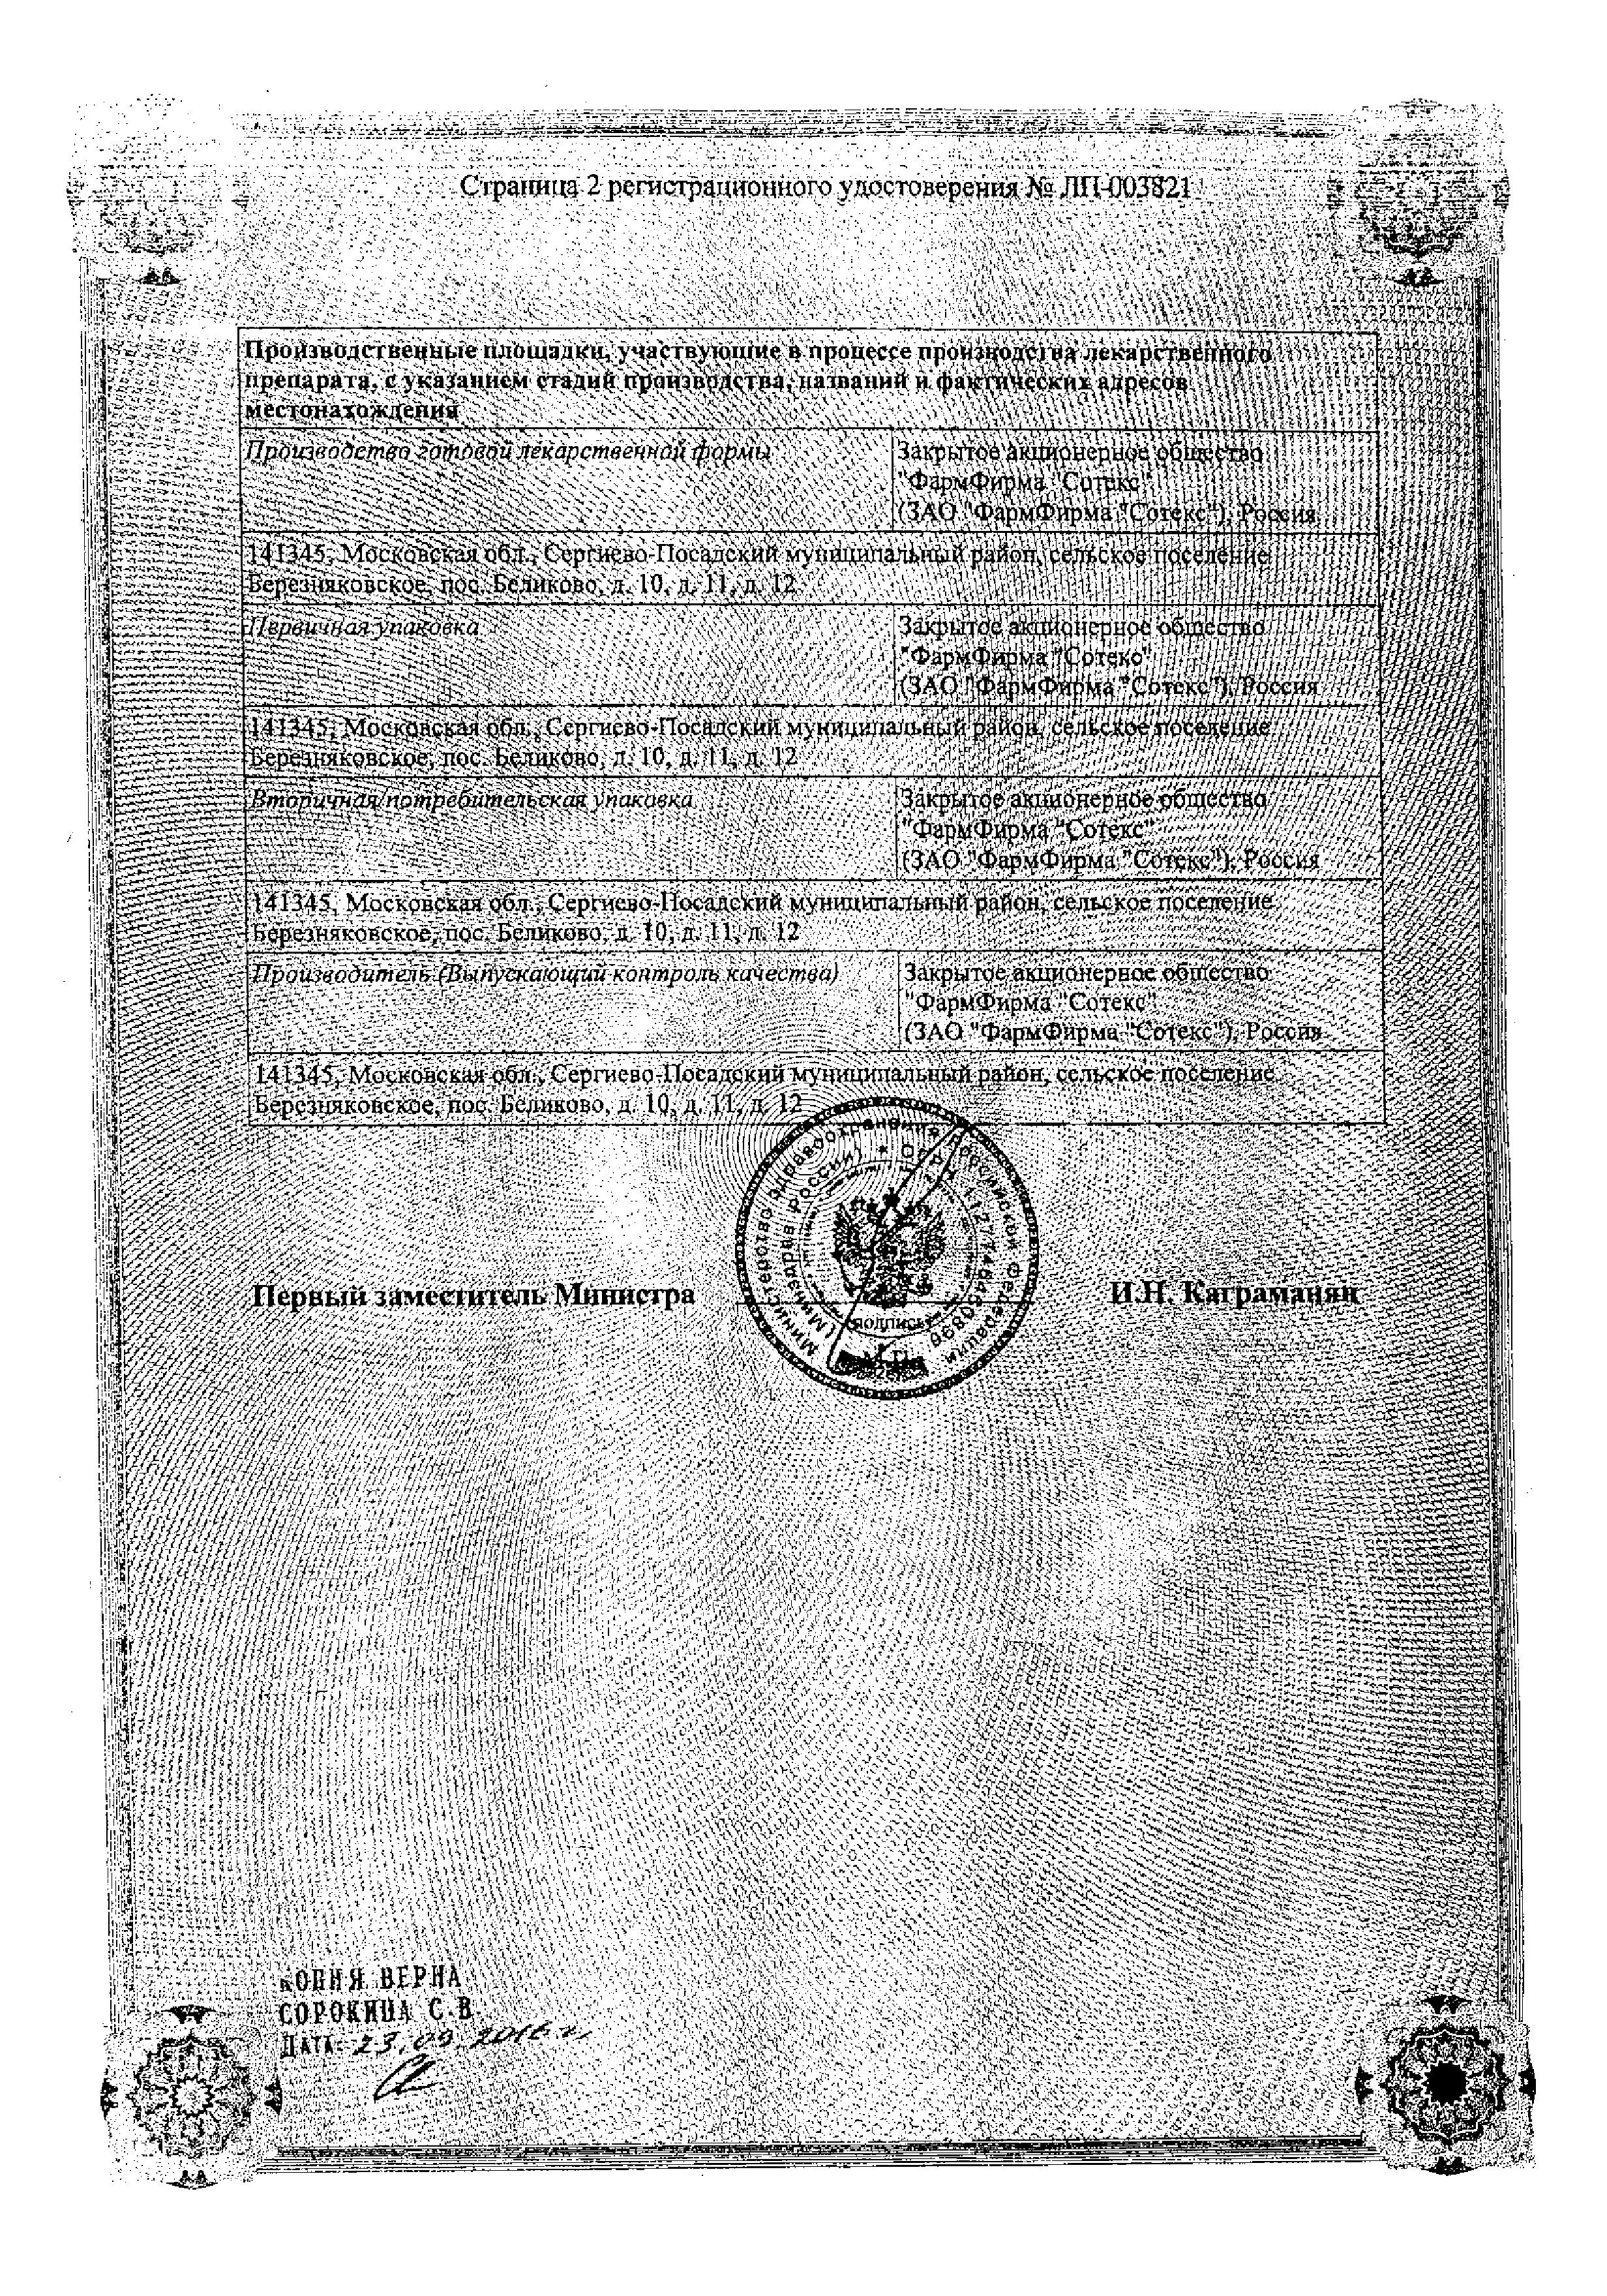 Калмирекс сертификат